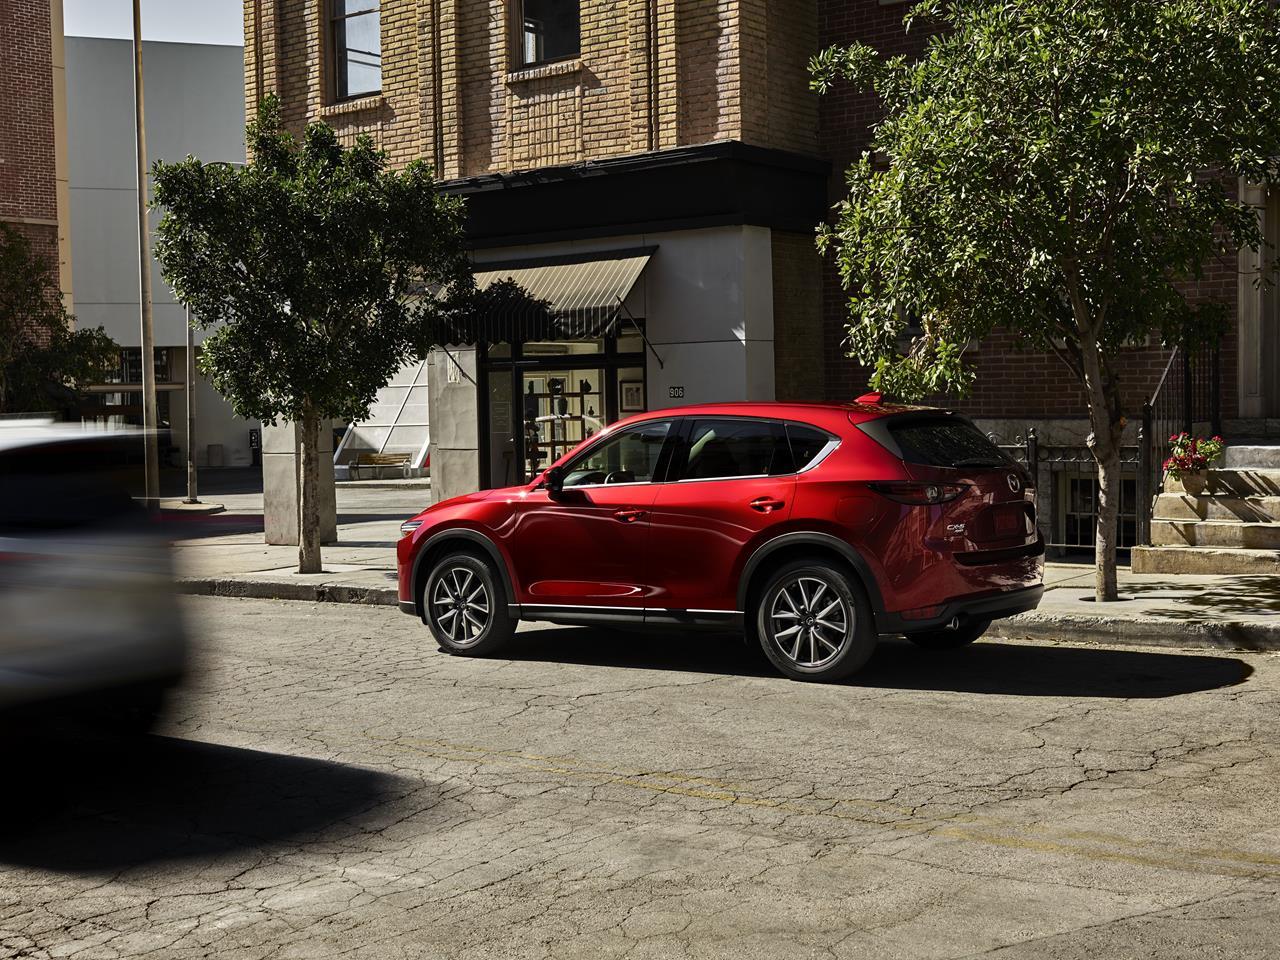 Mazda CX-5 photo 171586